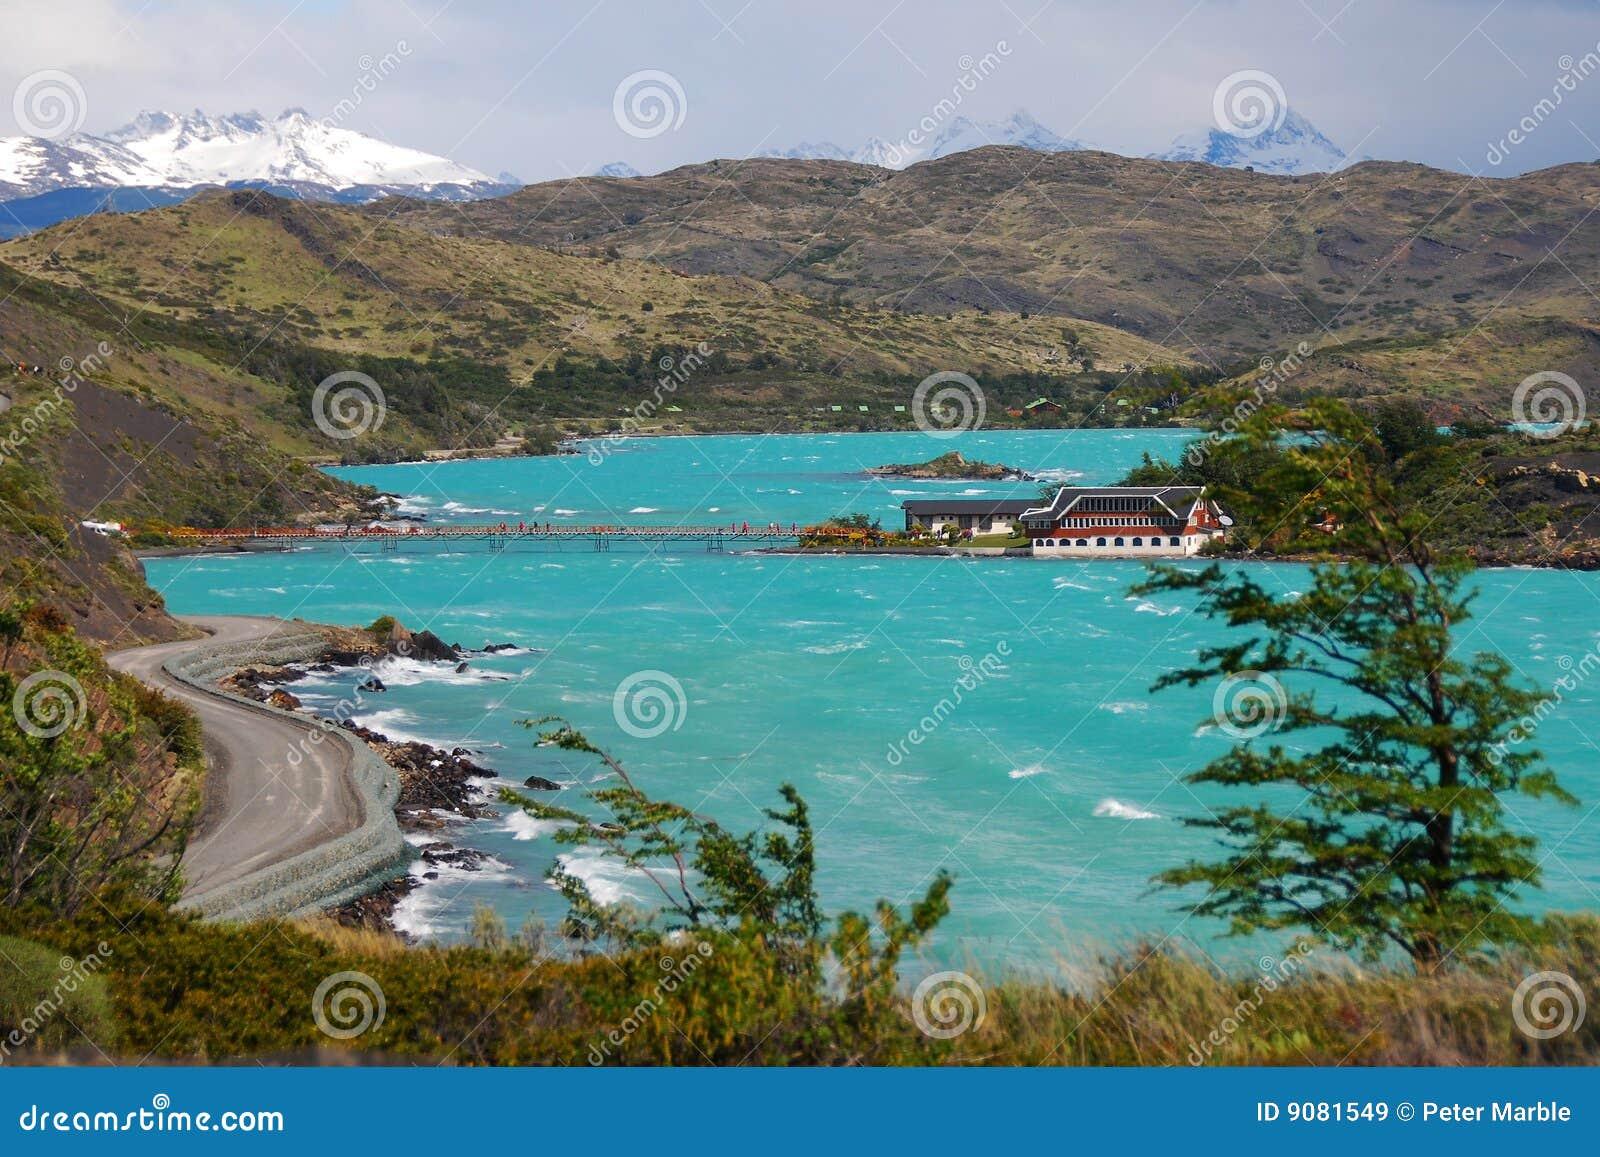 Lago Pehoe in Torres Del Paine